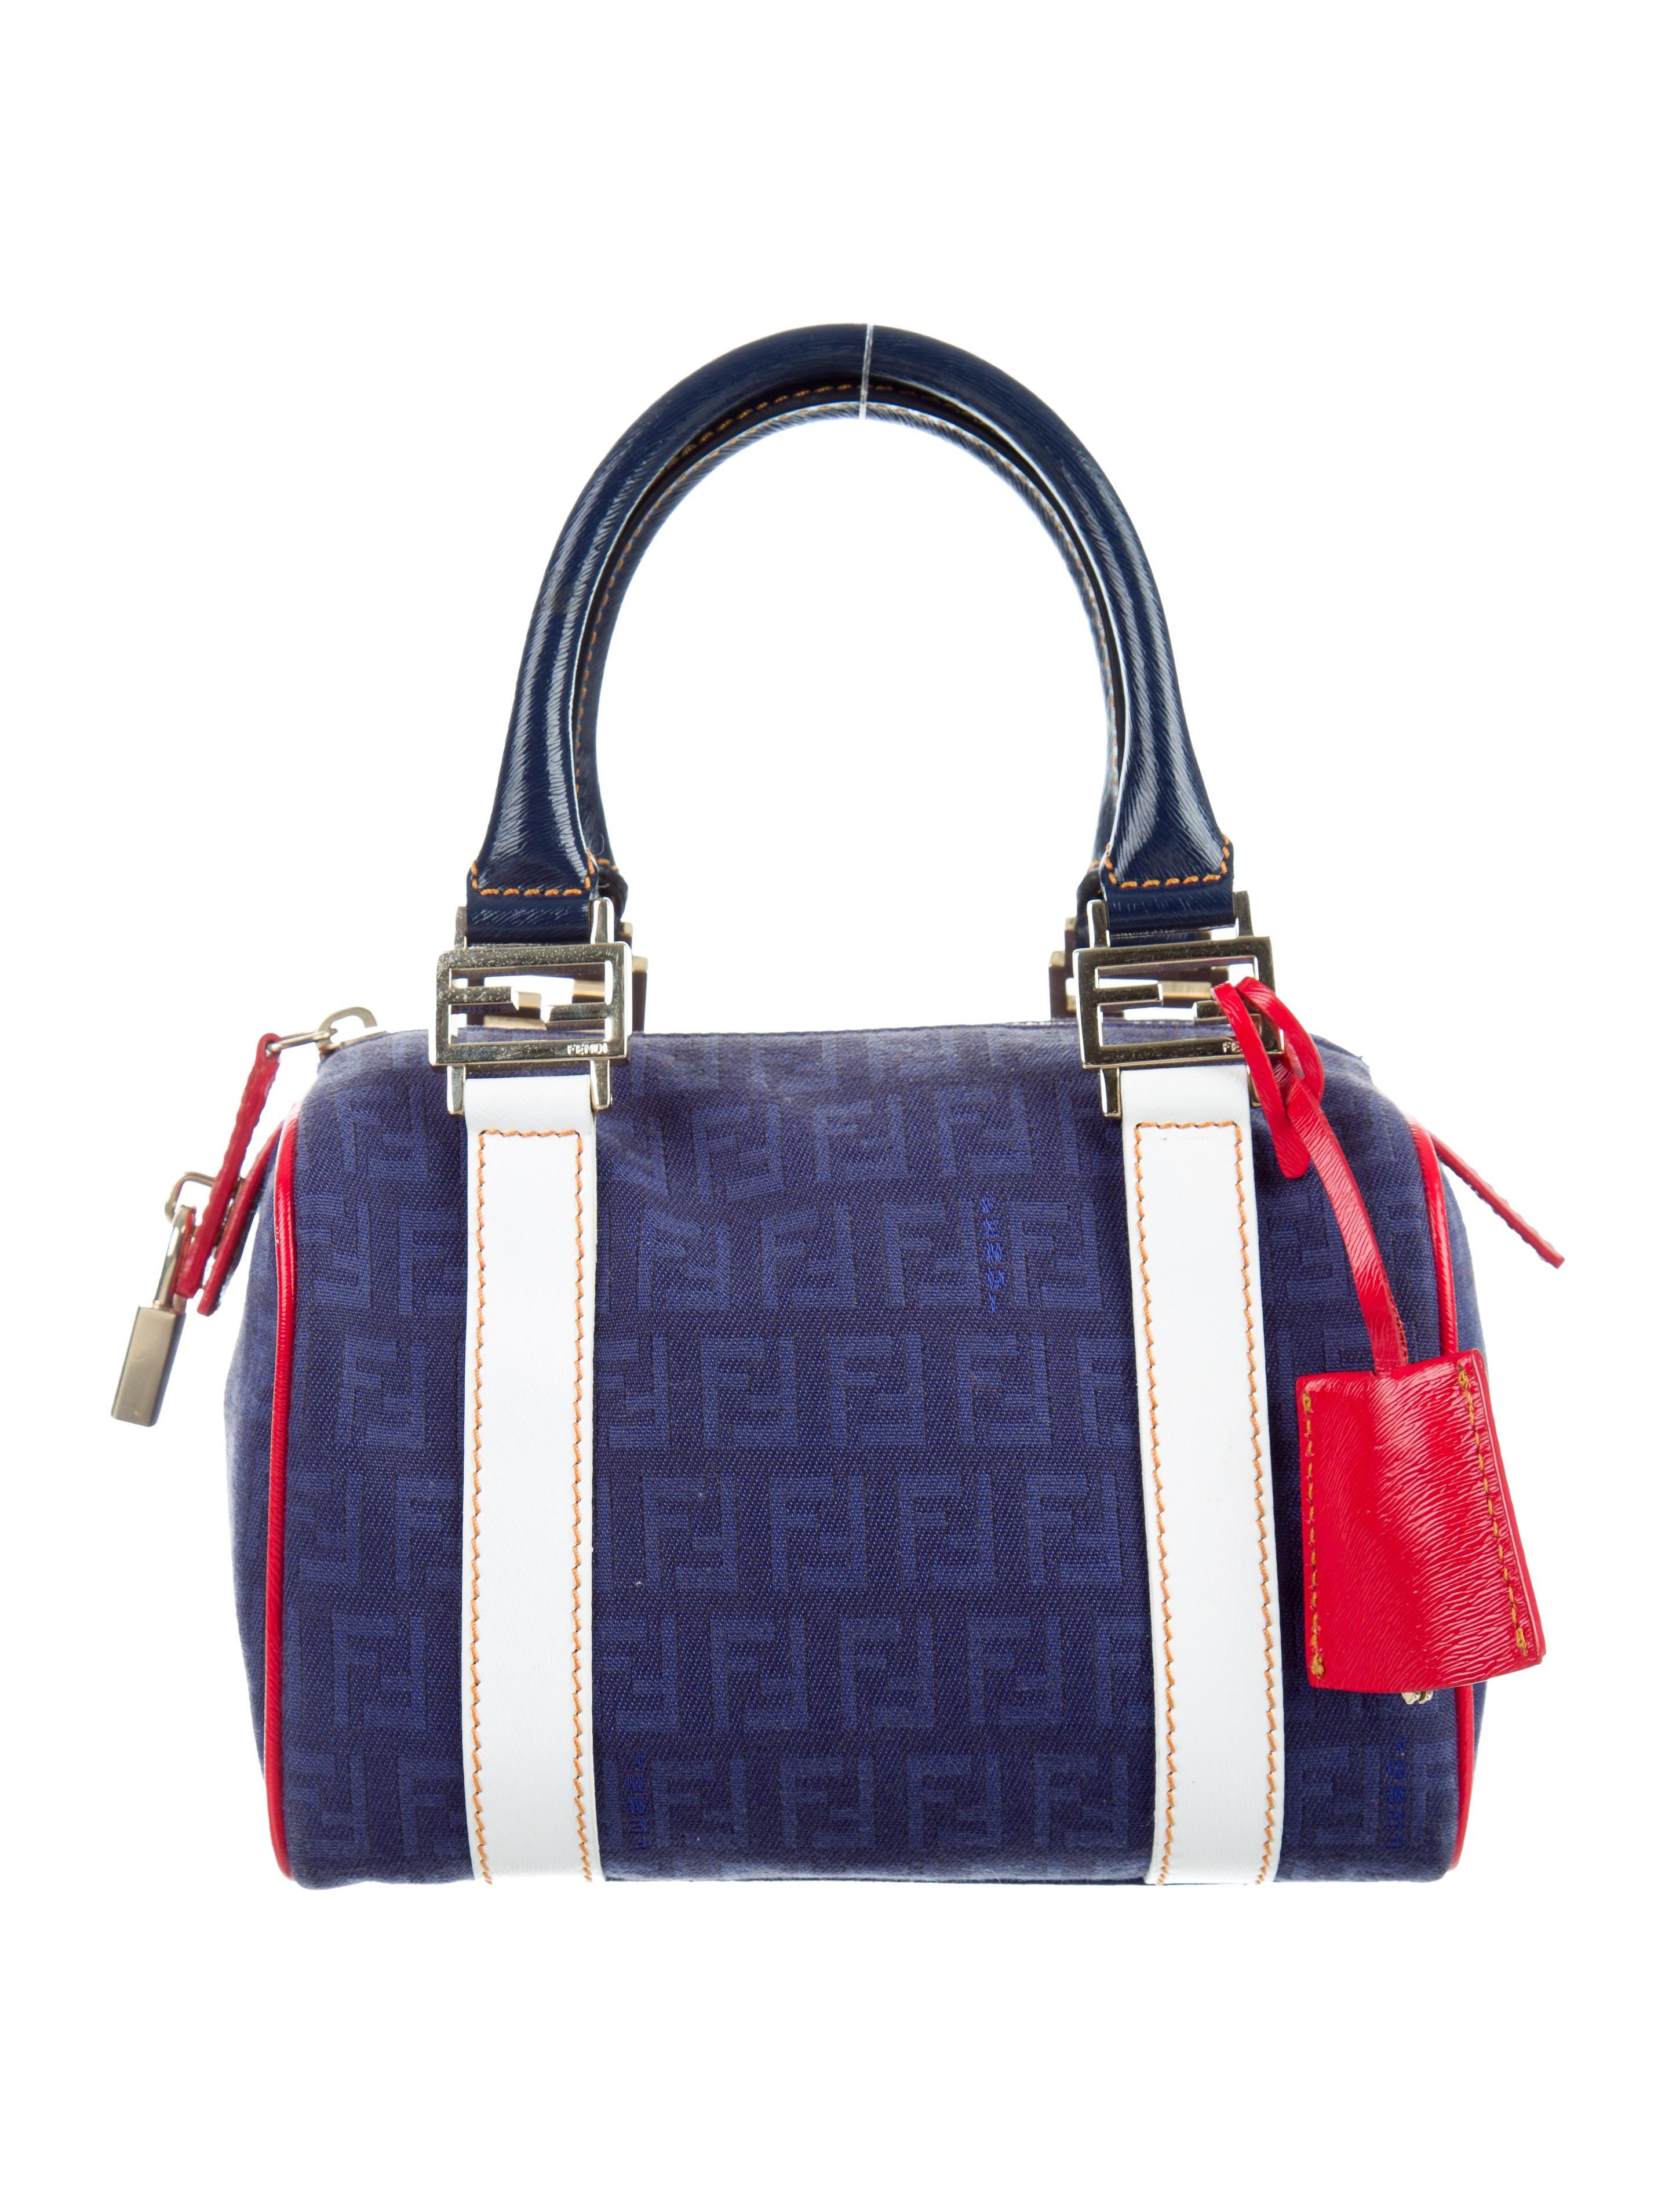 Boston Bag Patchwork Tutorial: Fendi Zucchino Mini Boston Bag - Handbags - FEN52475